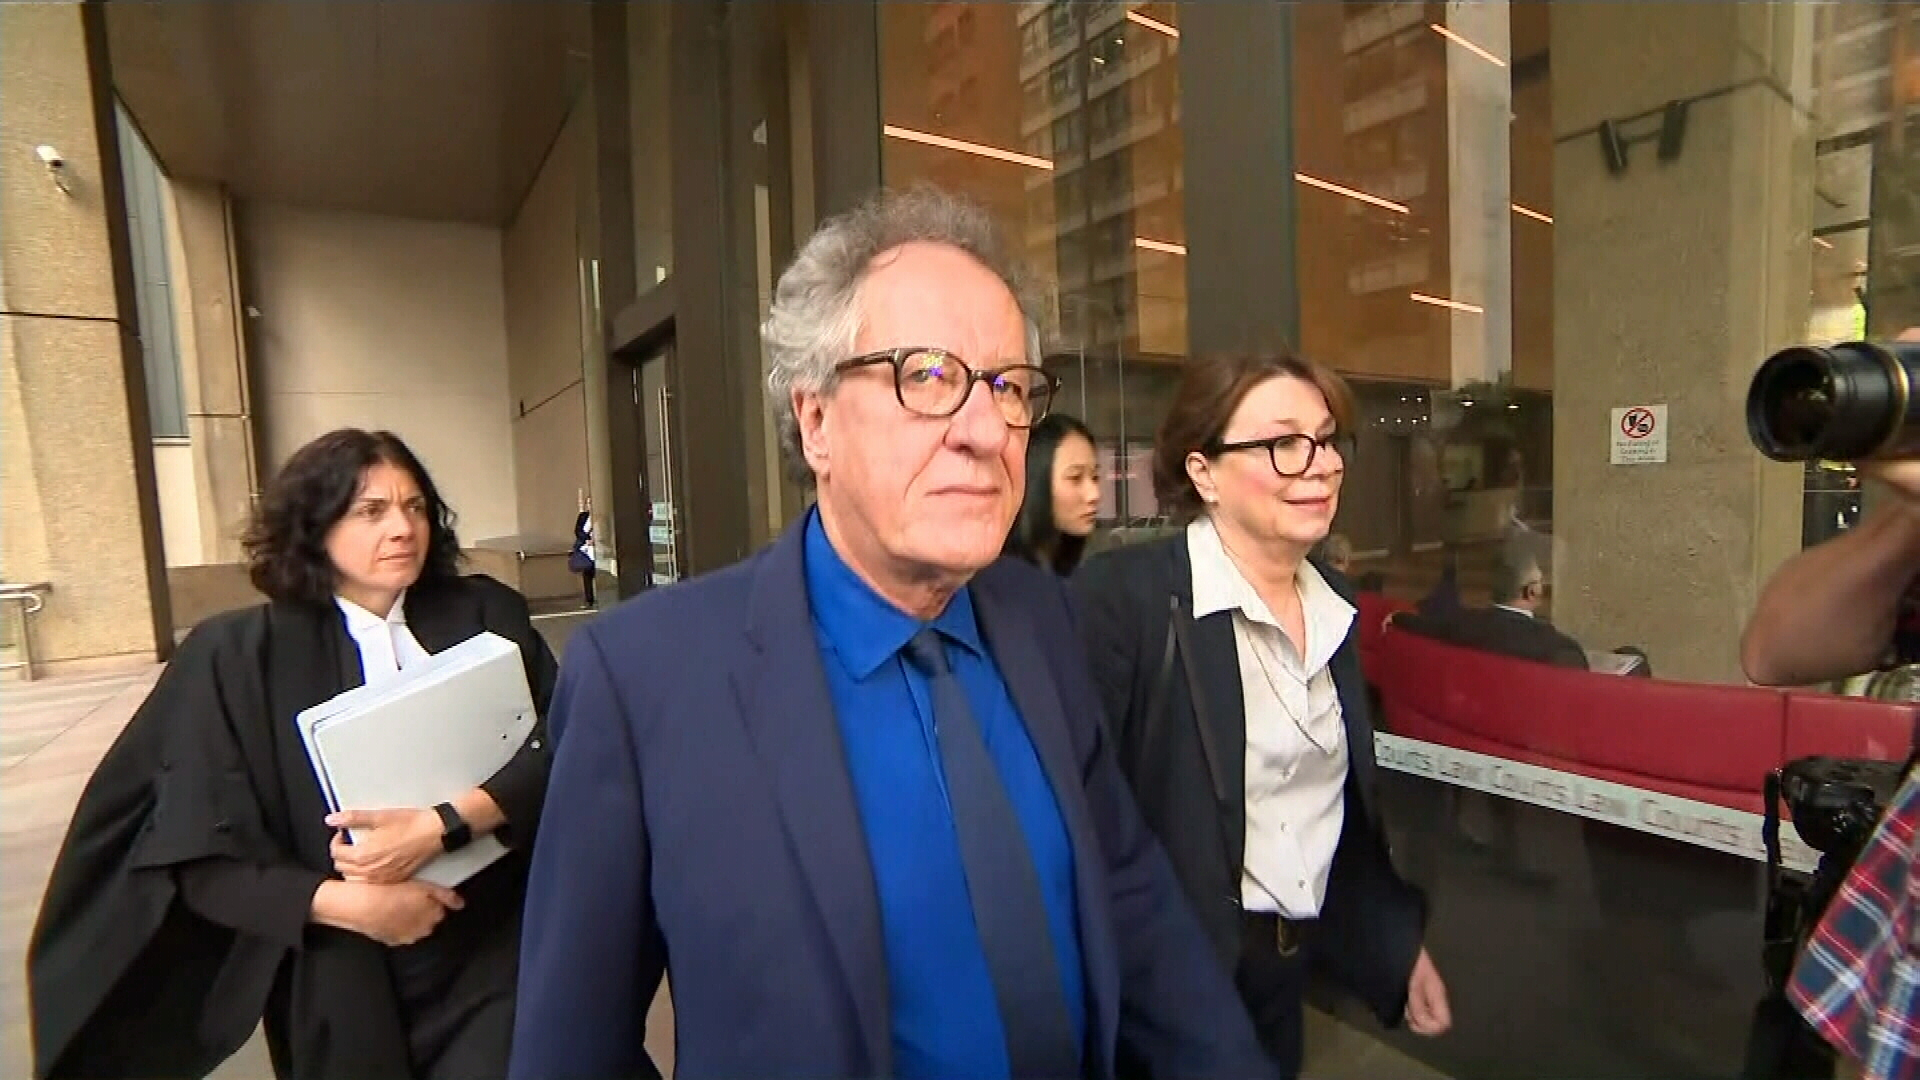 Geoffrey Rush arrives for defamation trial